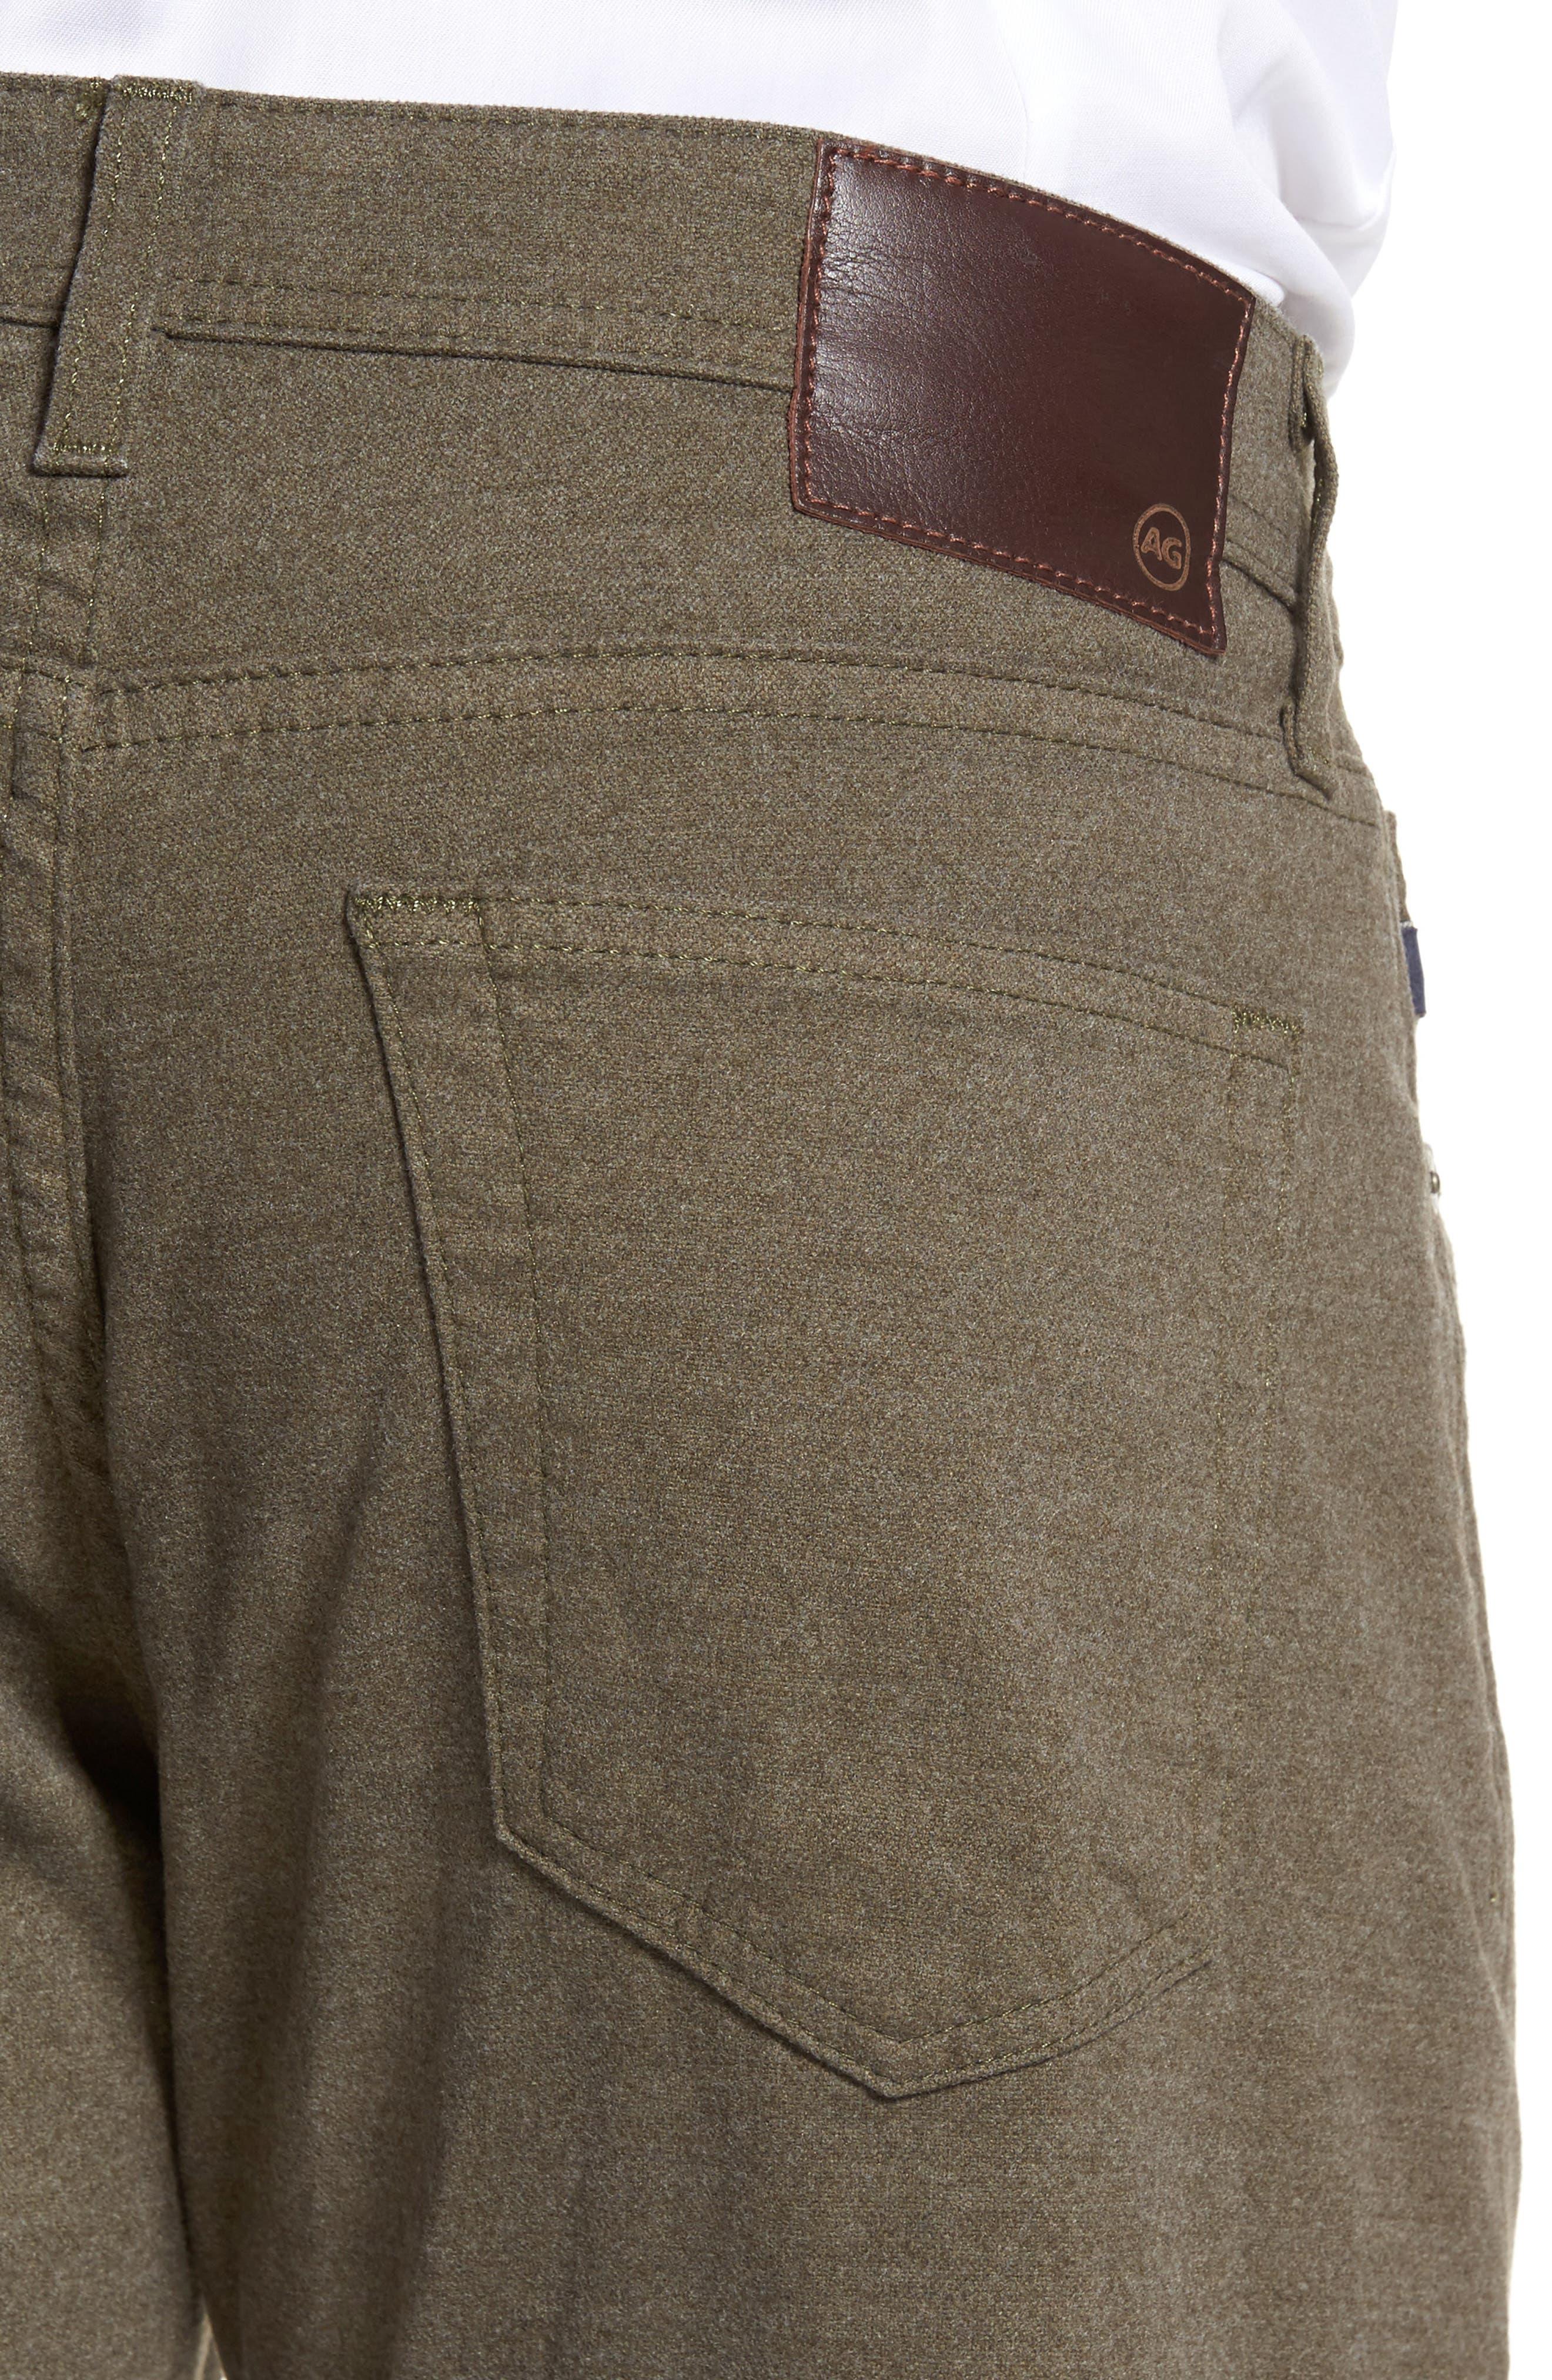 Graduate Tailored Five-Pocket Straight Leg Pants,                             Alternate thumbnail 4, color,                             CLIMBING IVY